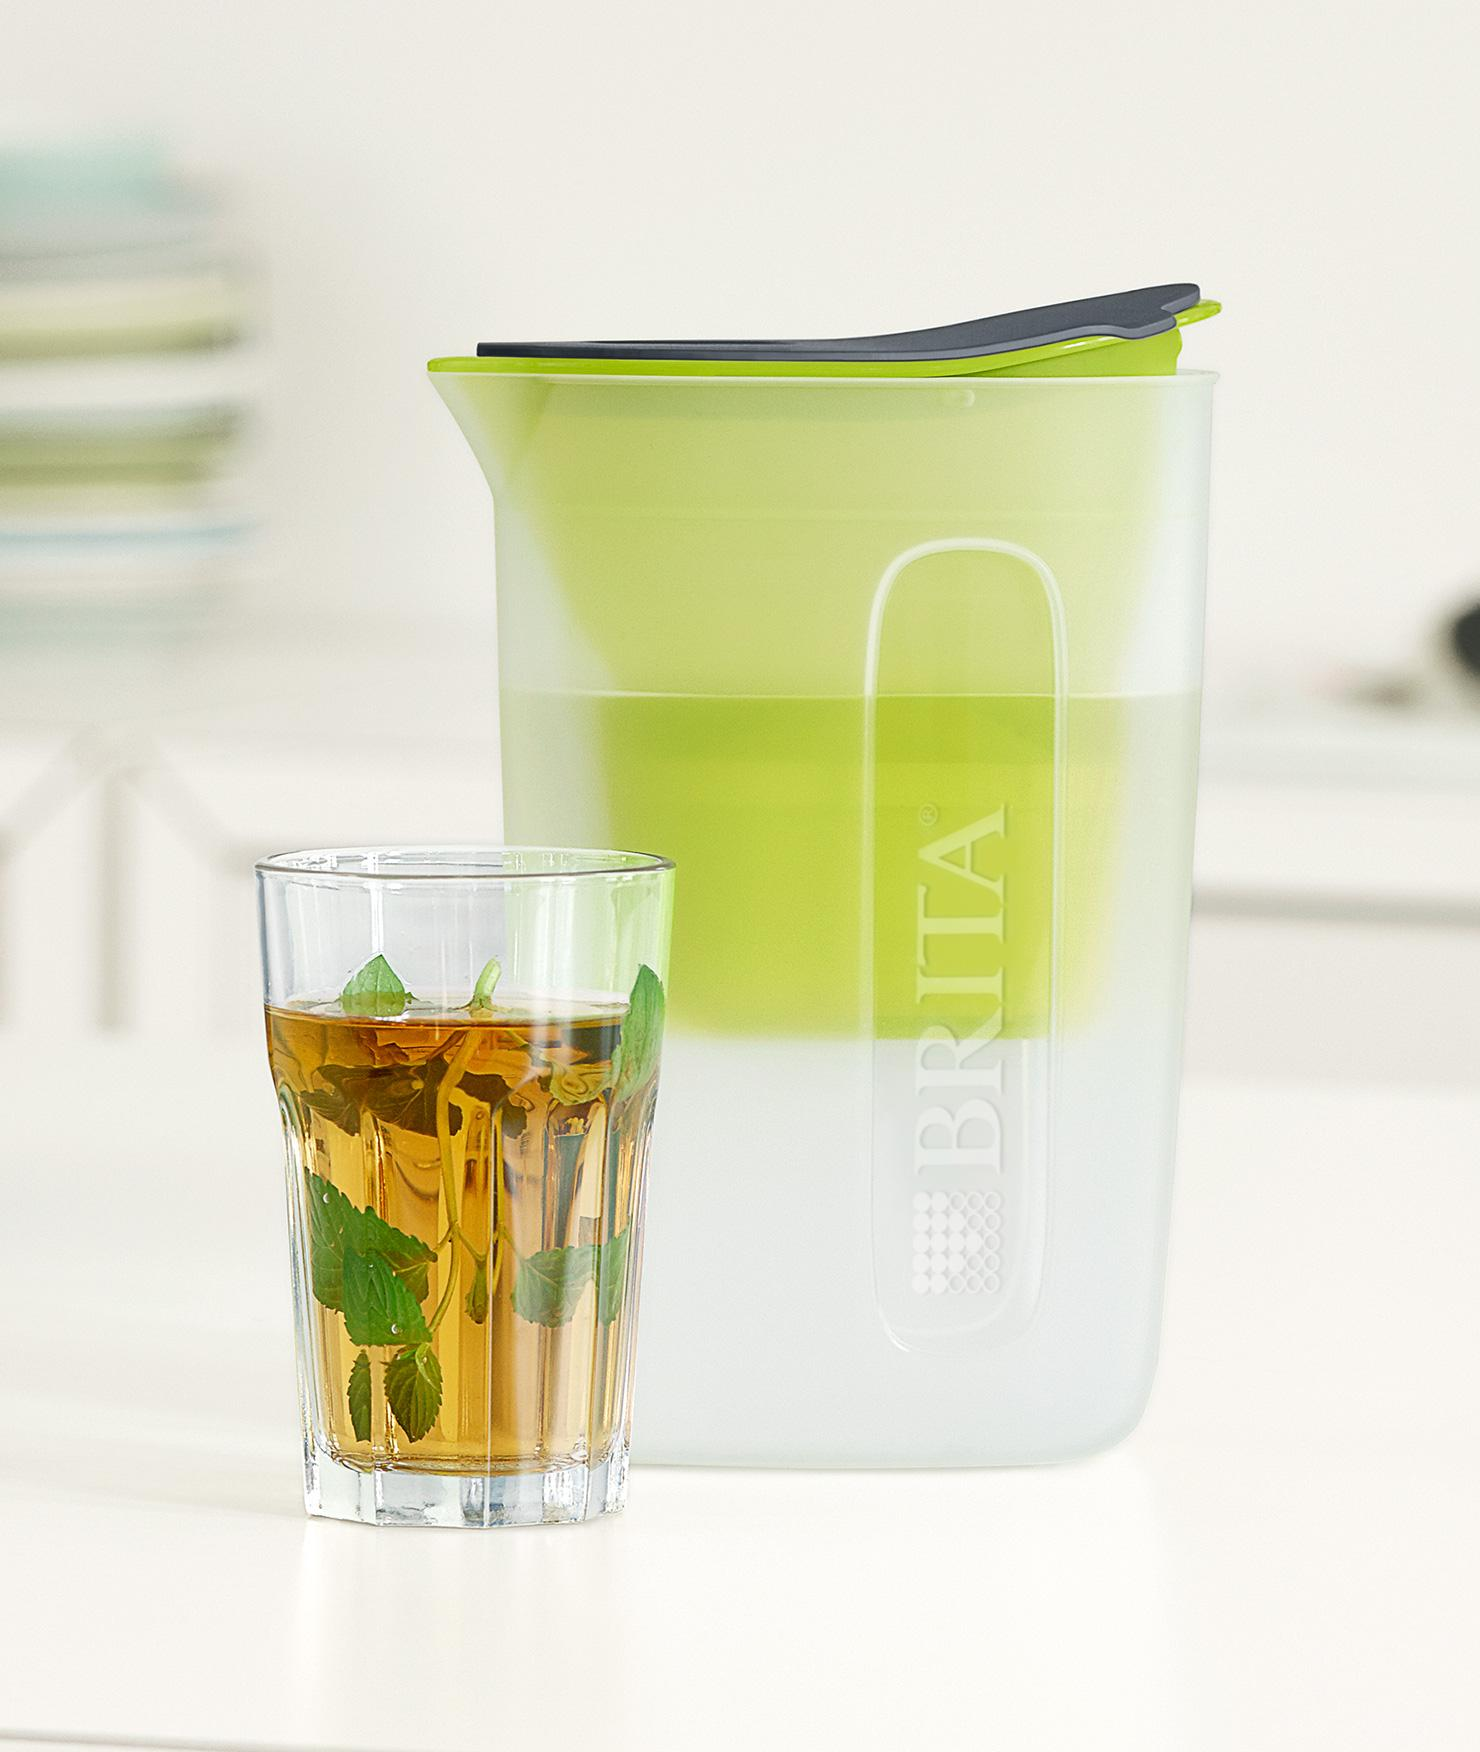 BRITA fill&enjoy Fun lime kitchen glass tea